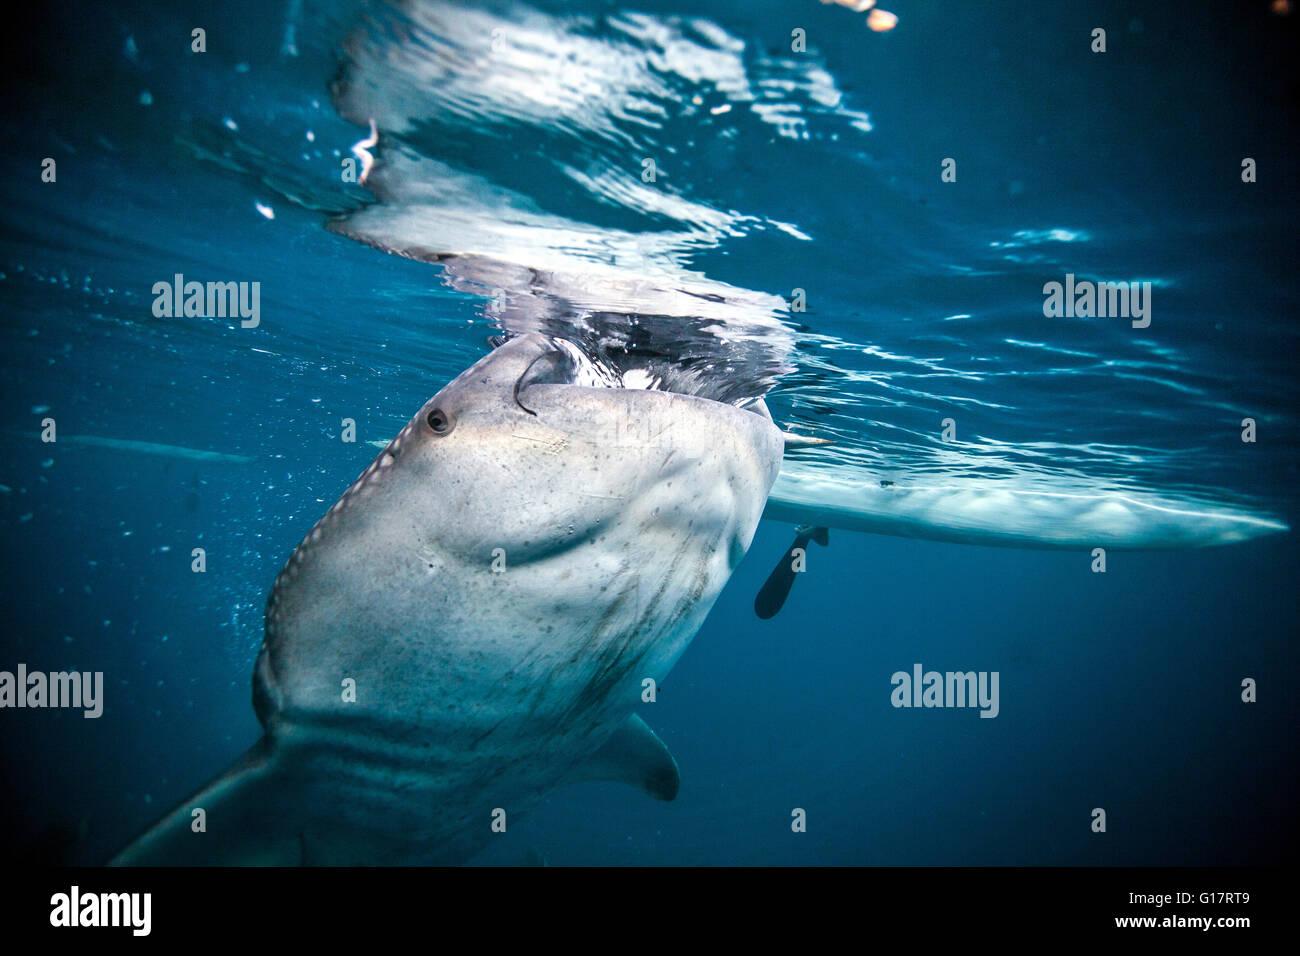 Un Whaleshark énorme (Rhincodon typus) sous un voile, natation, Cebu, Philippines Photo Stock